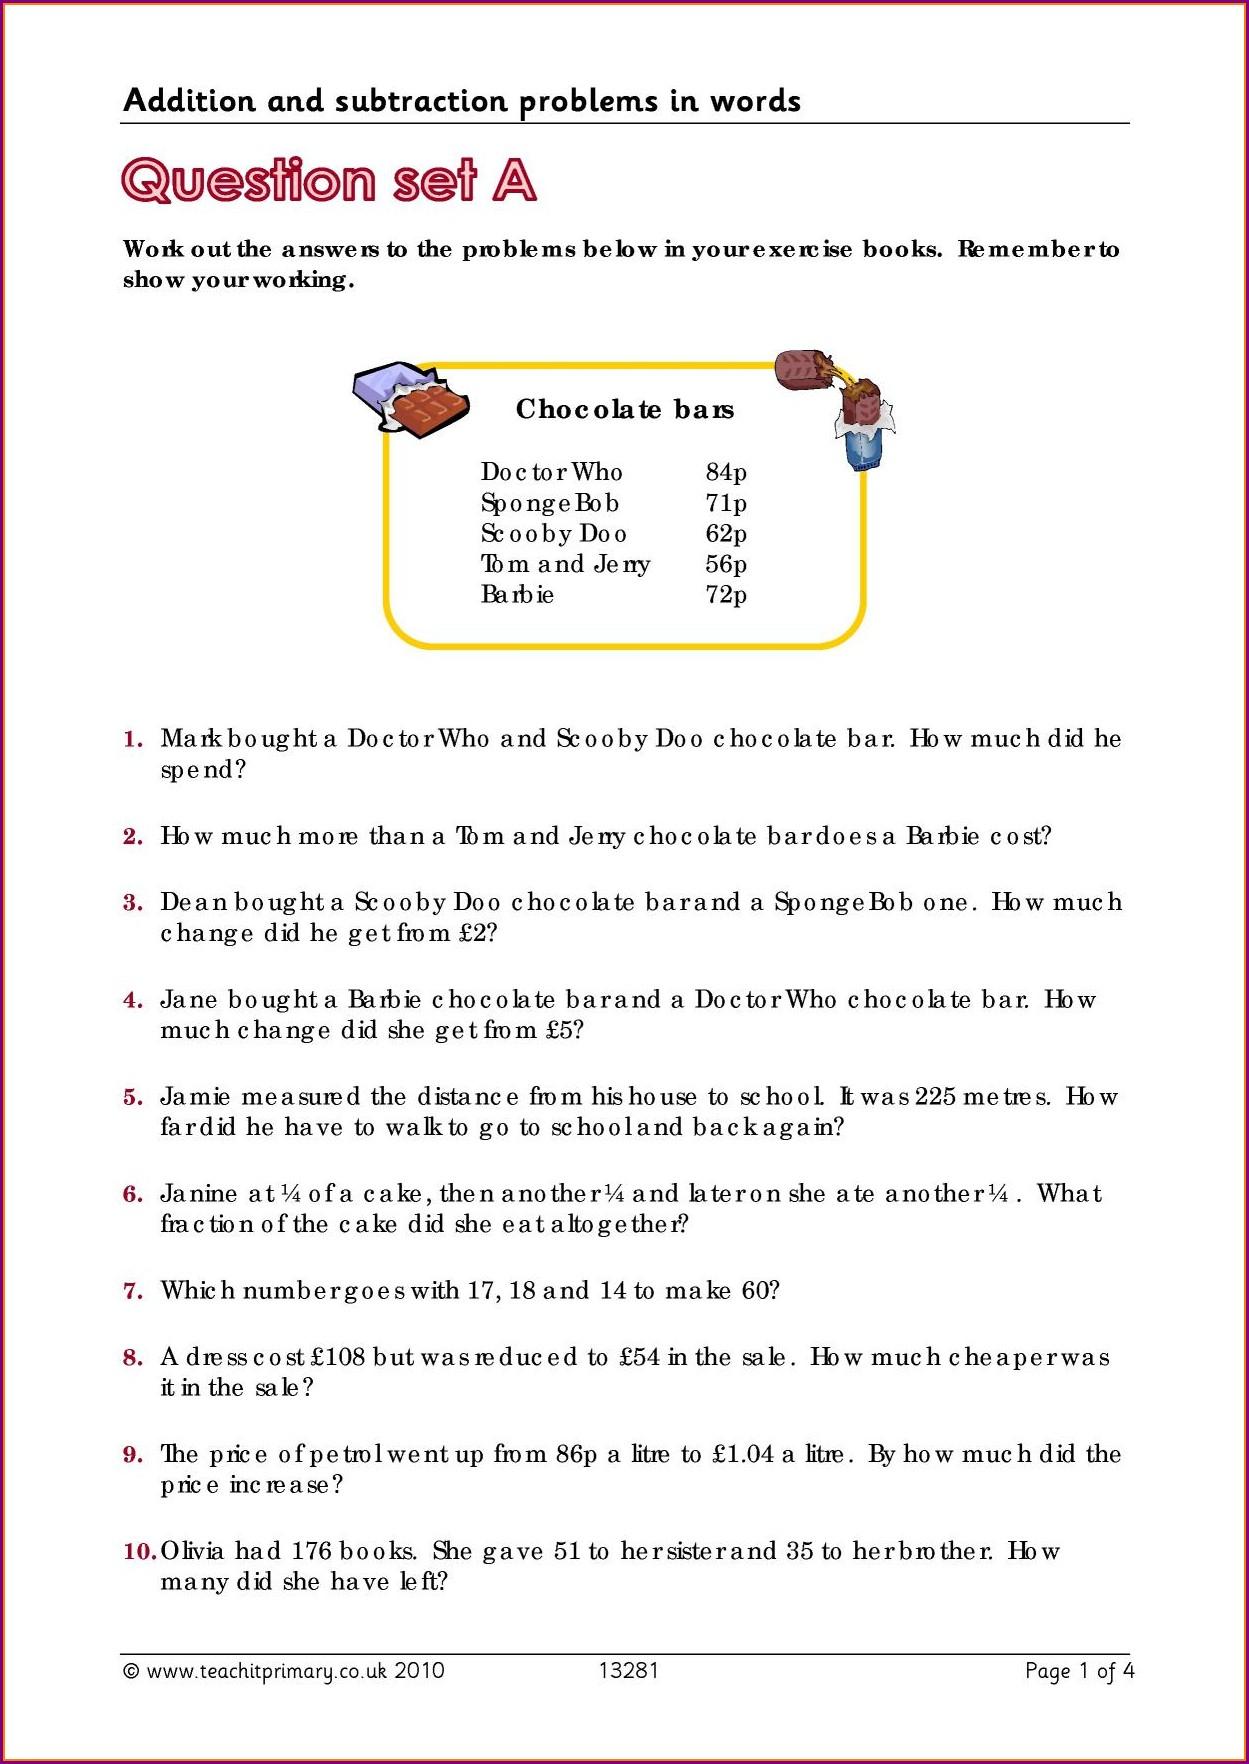 Scientific Method Analysis Worksheet Answers